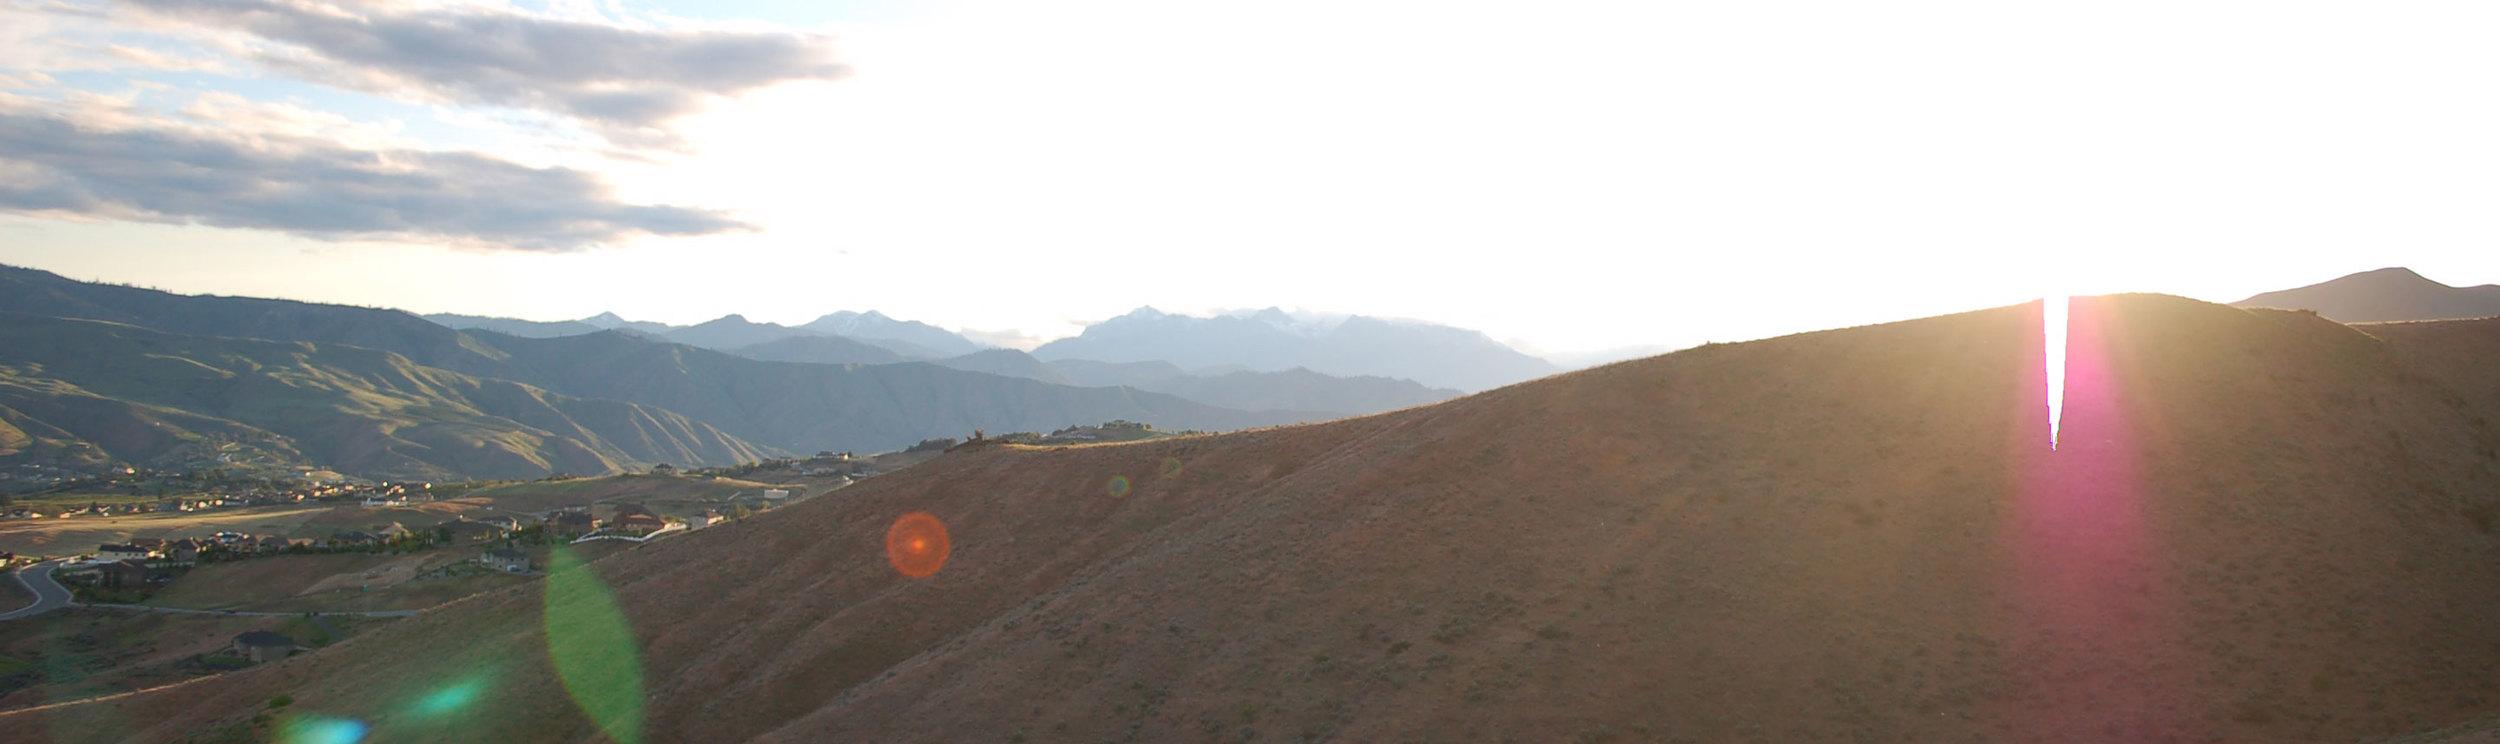 Foothills-Horizon.jpg